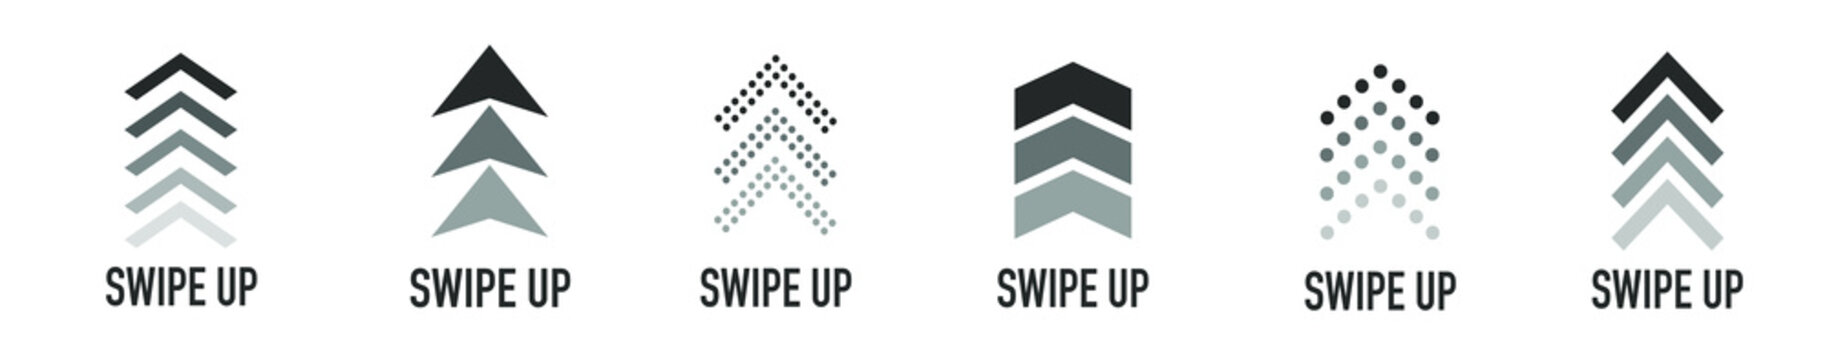 Arrow up for social media stories, design blogger, scroll pictogram. Set of Black Swipe Up icon. Scroll pictogram. Stories swipe button. Text swipe up